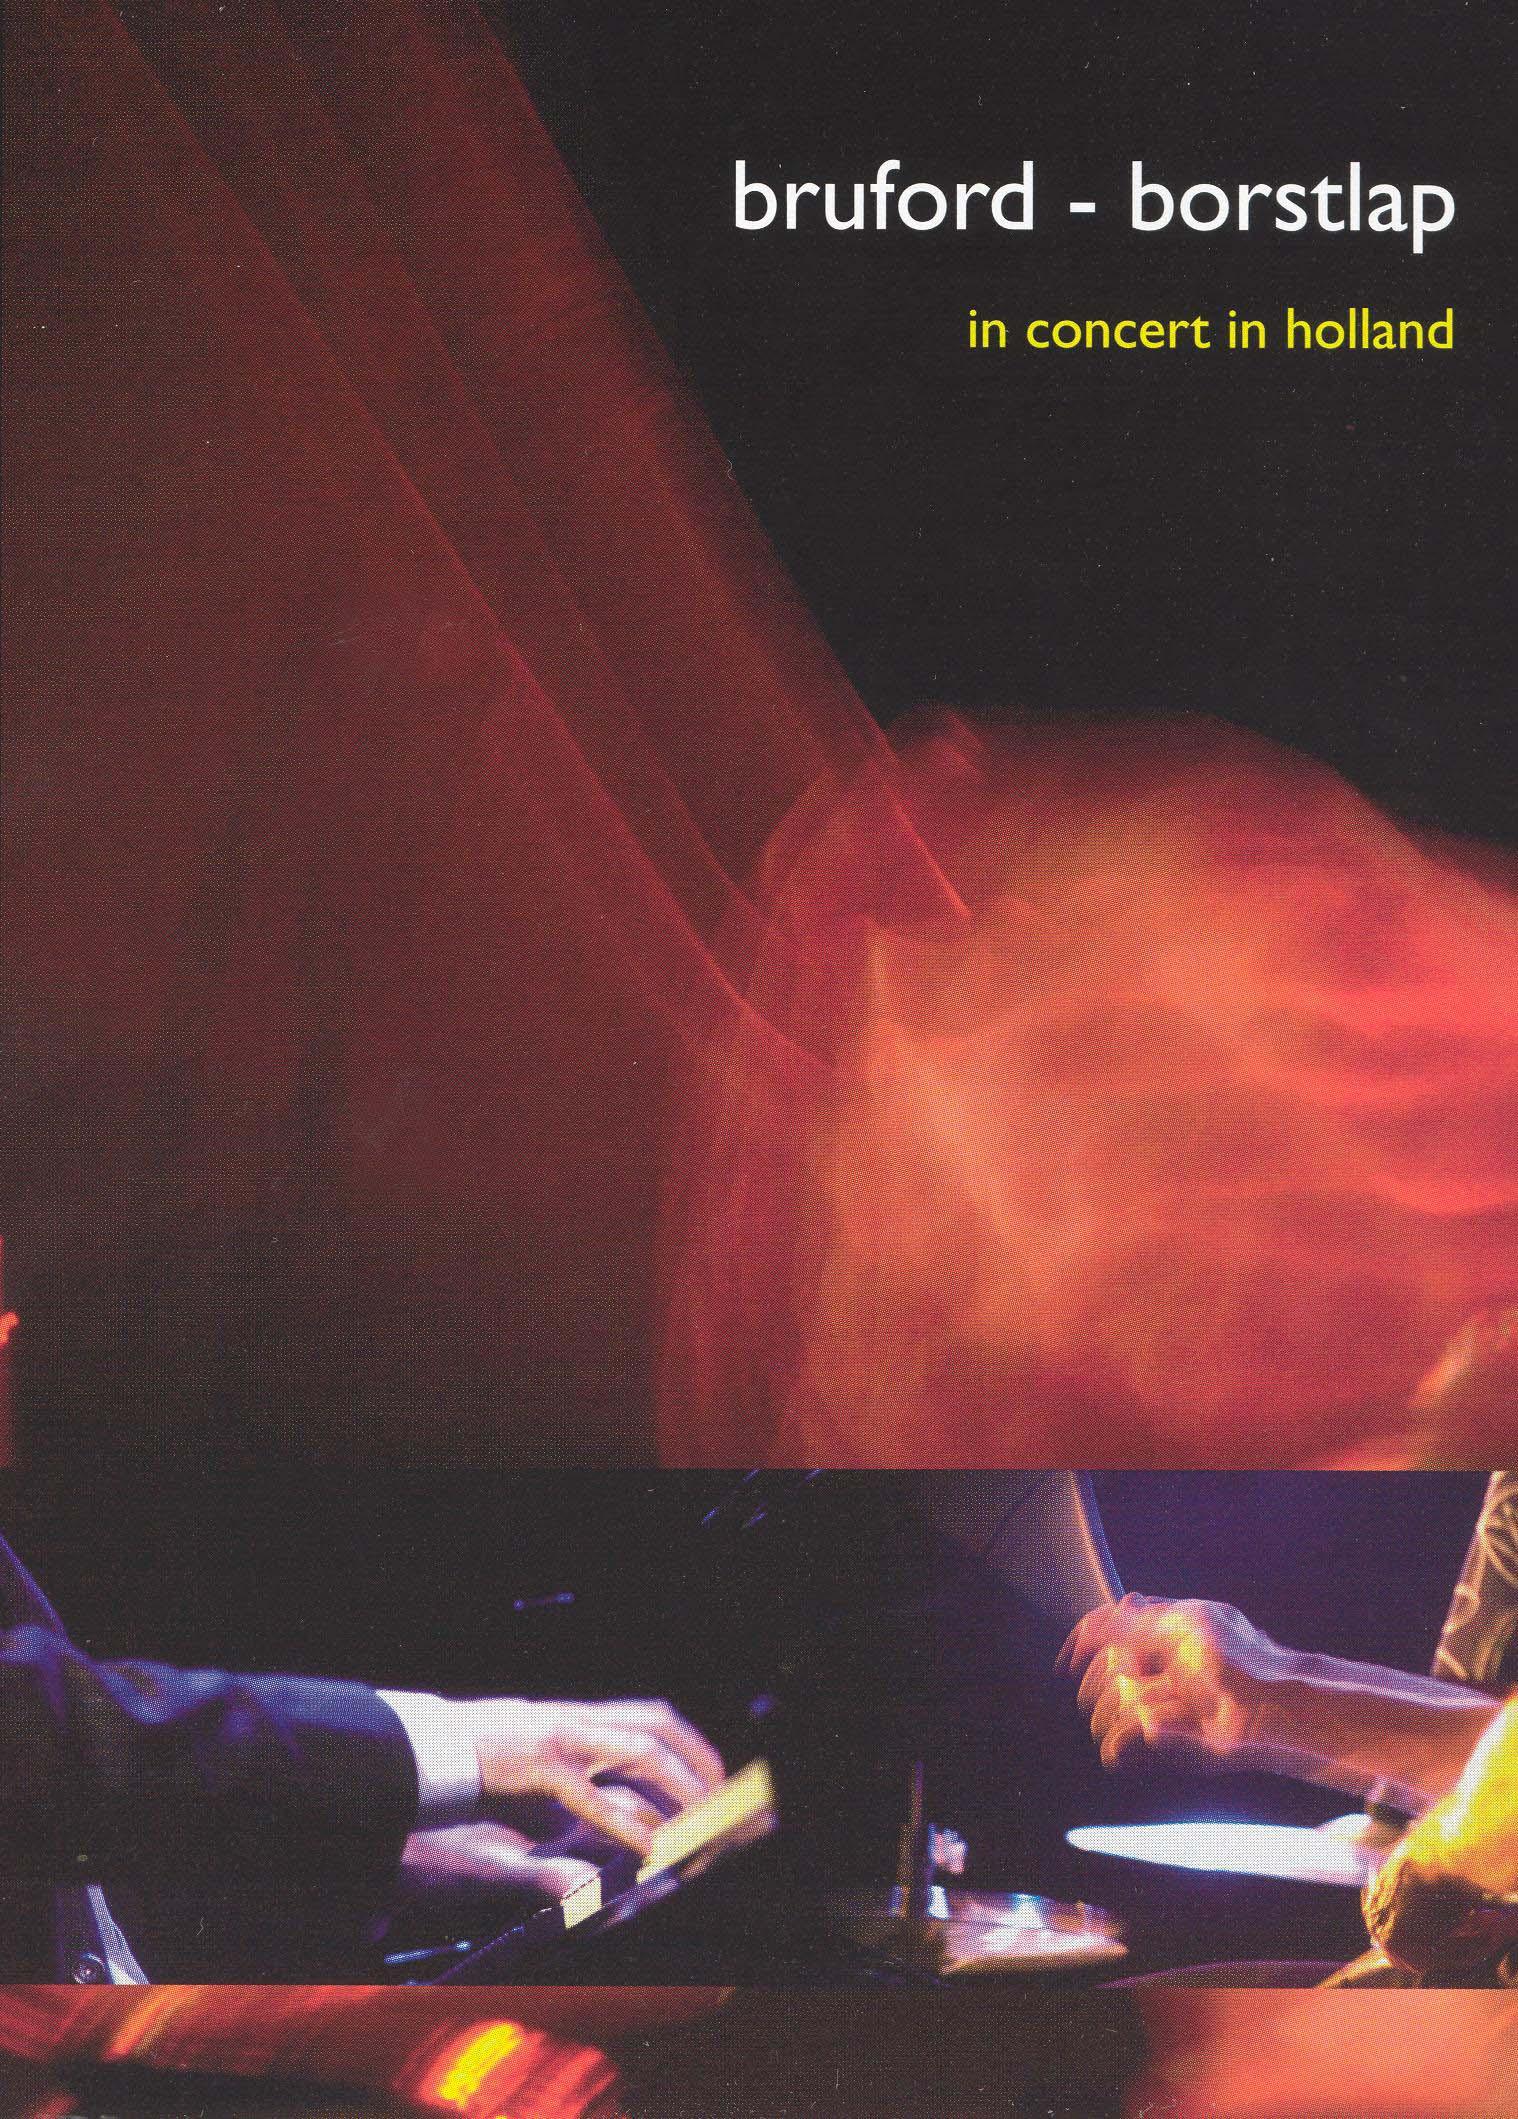 Bruford-Borstlap: In Concert in Holland